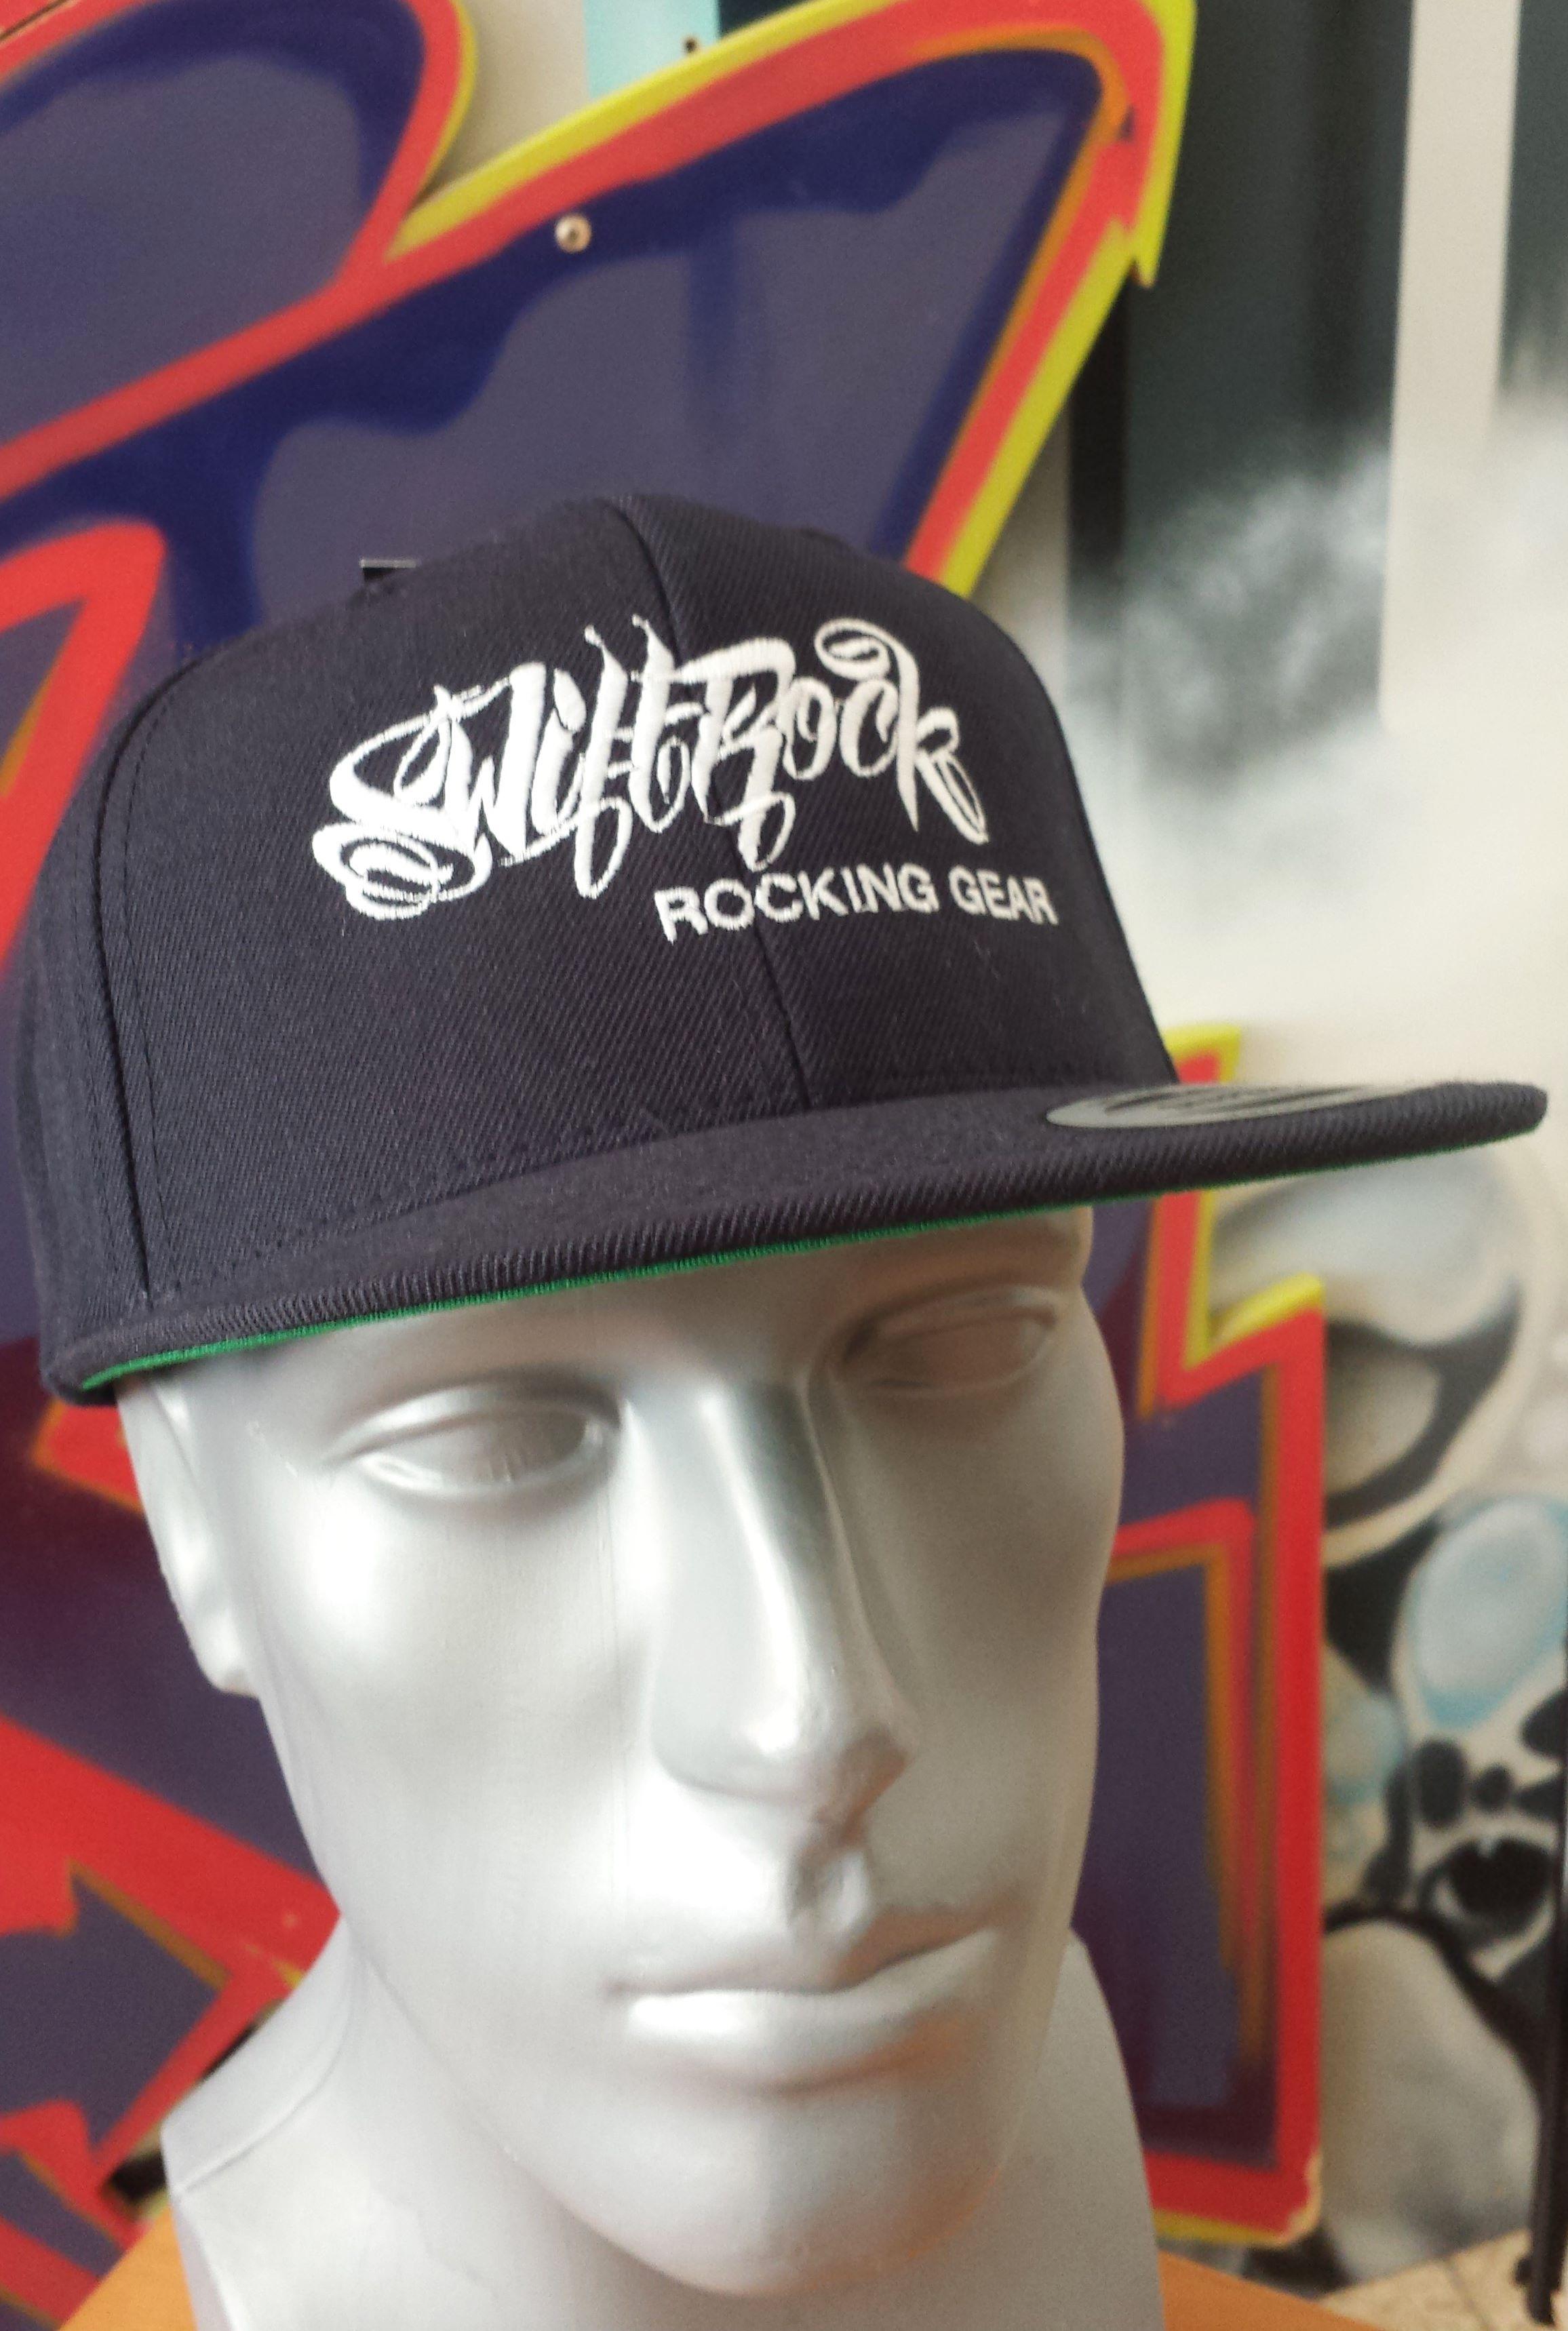 733686736b7 Swift Rock Shop - Official Store - Rocking Gear Snapback Logo Cap Navy